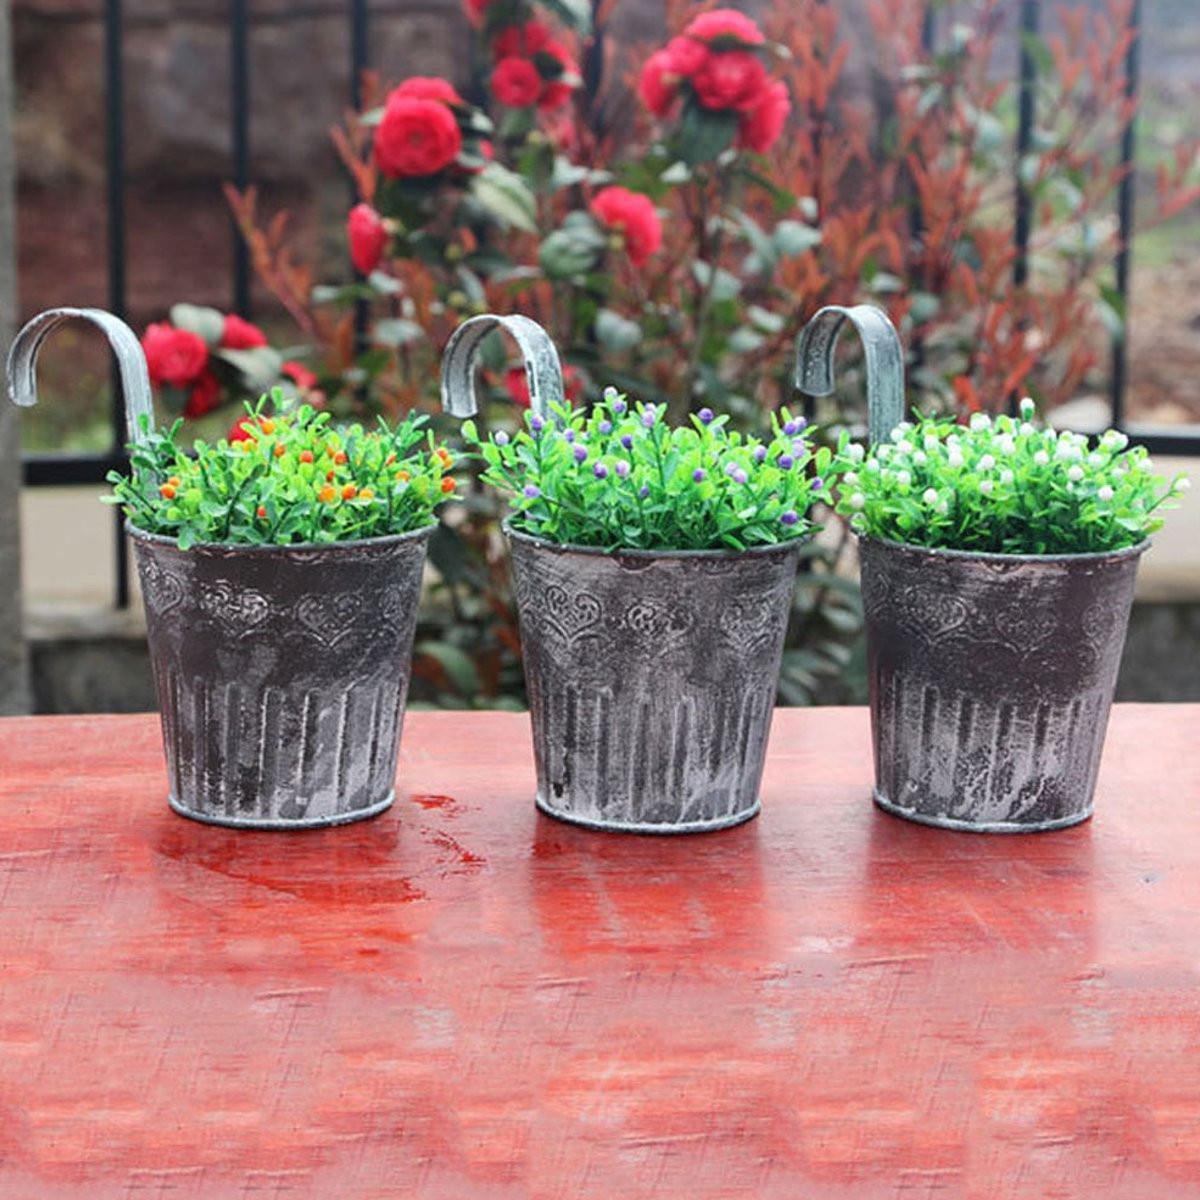 Medium Of Balcony Garden Planters